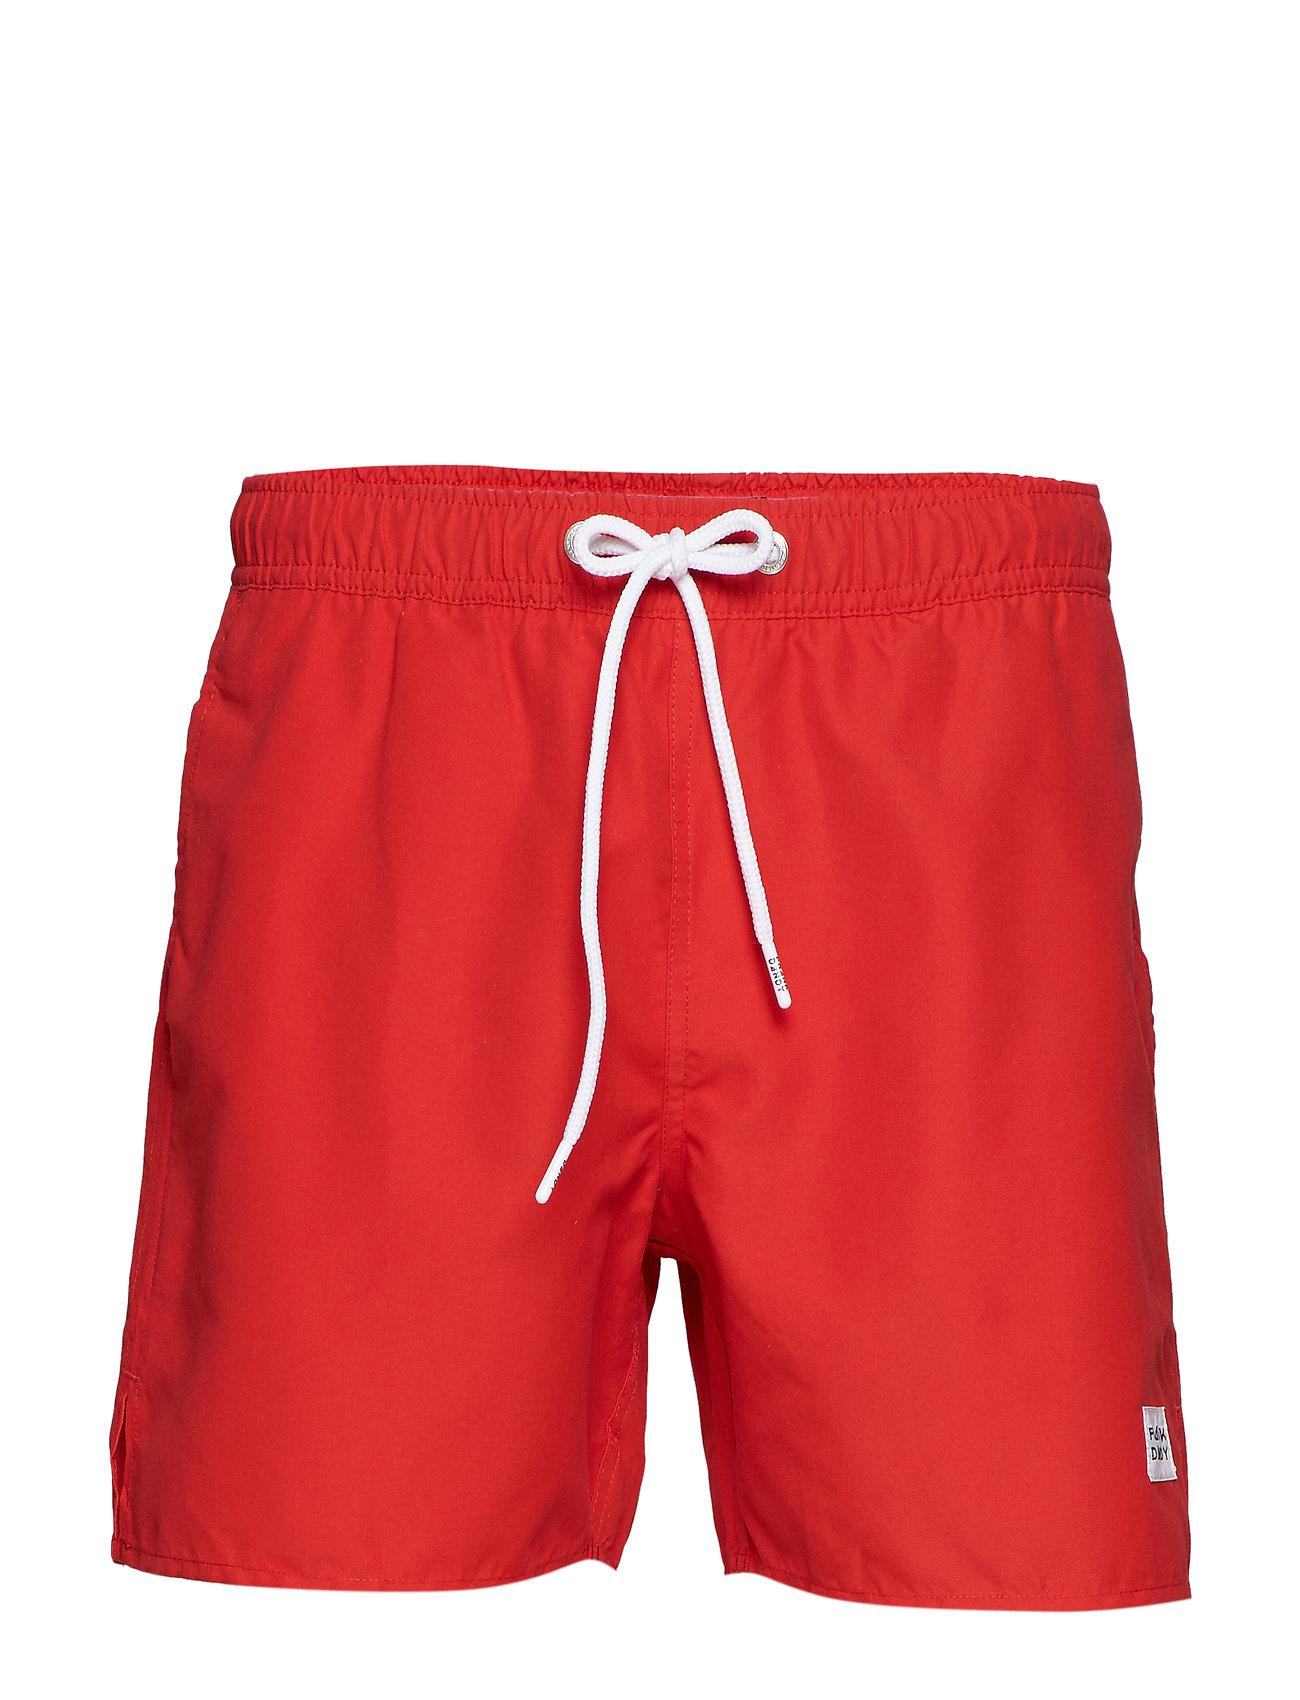 Frank Dandy Breeze Long Swim Shorts - RED